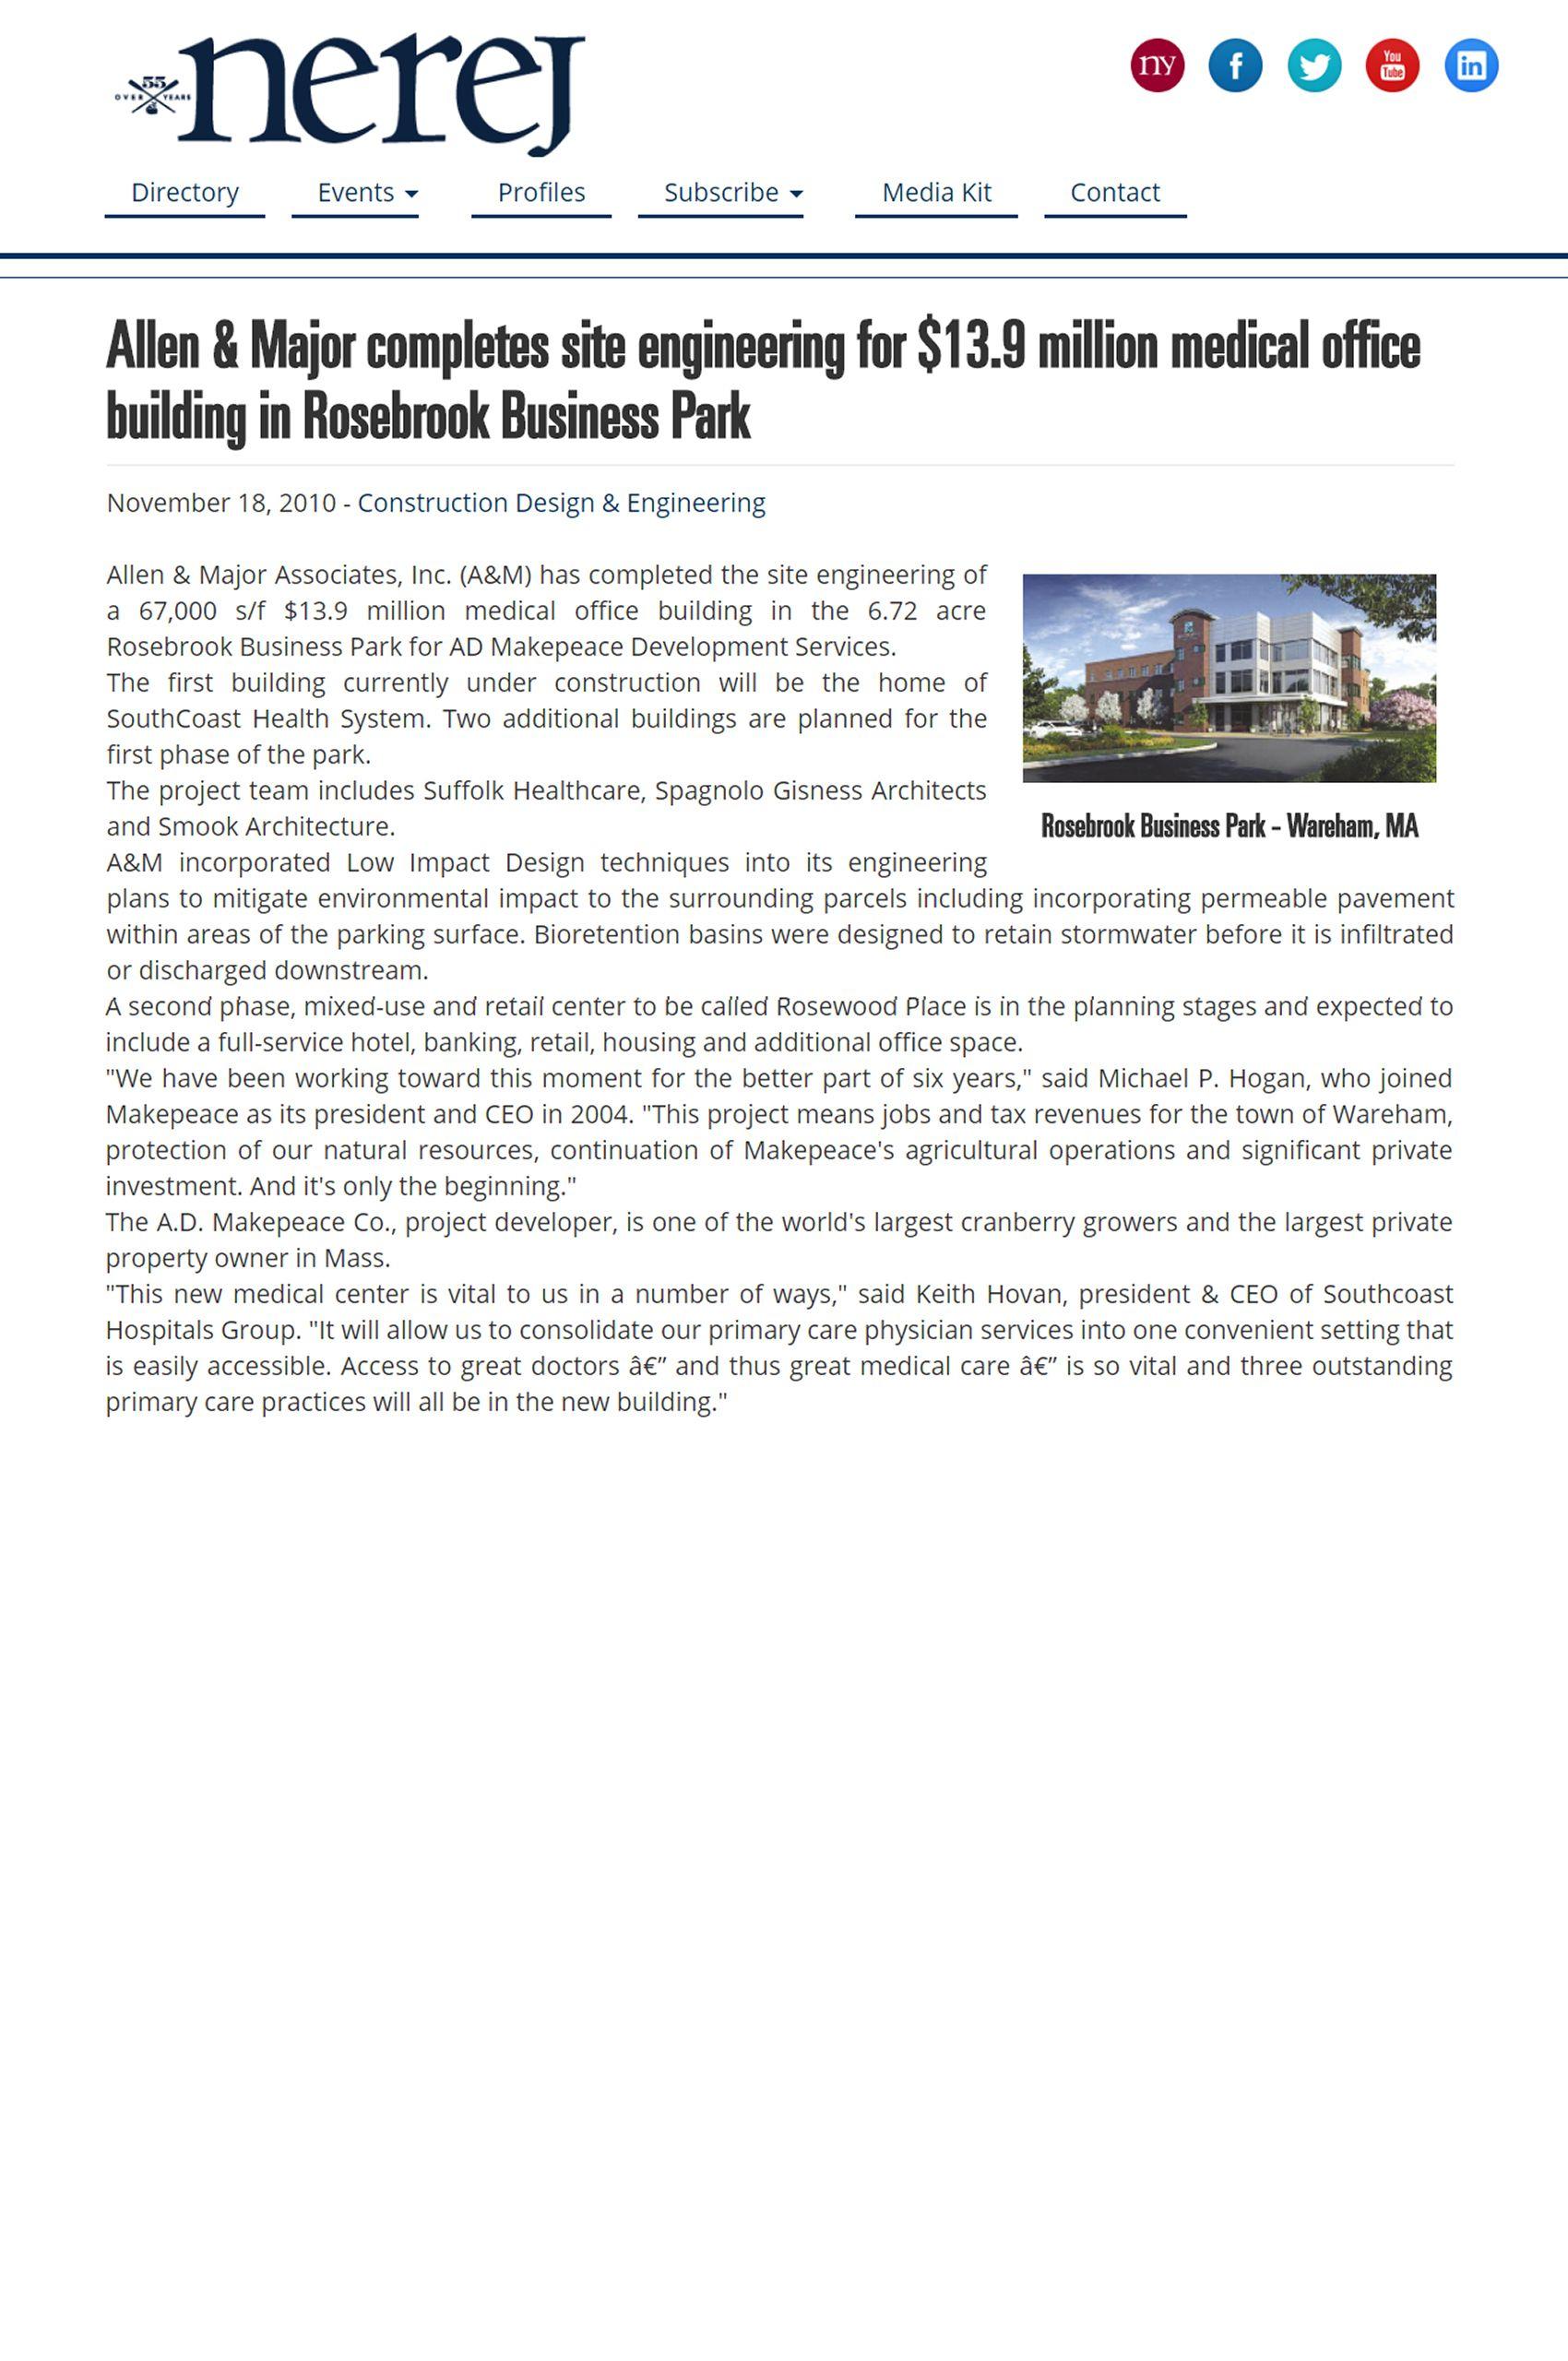 Allen-Major-completes-site-engineering-for-13-million-medical-office-building-in-rosebrook-business-park-11-08-2010.jpg